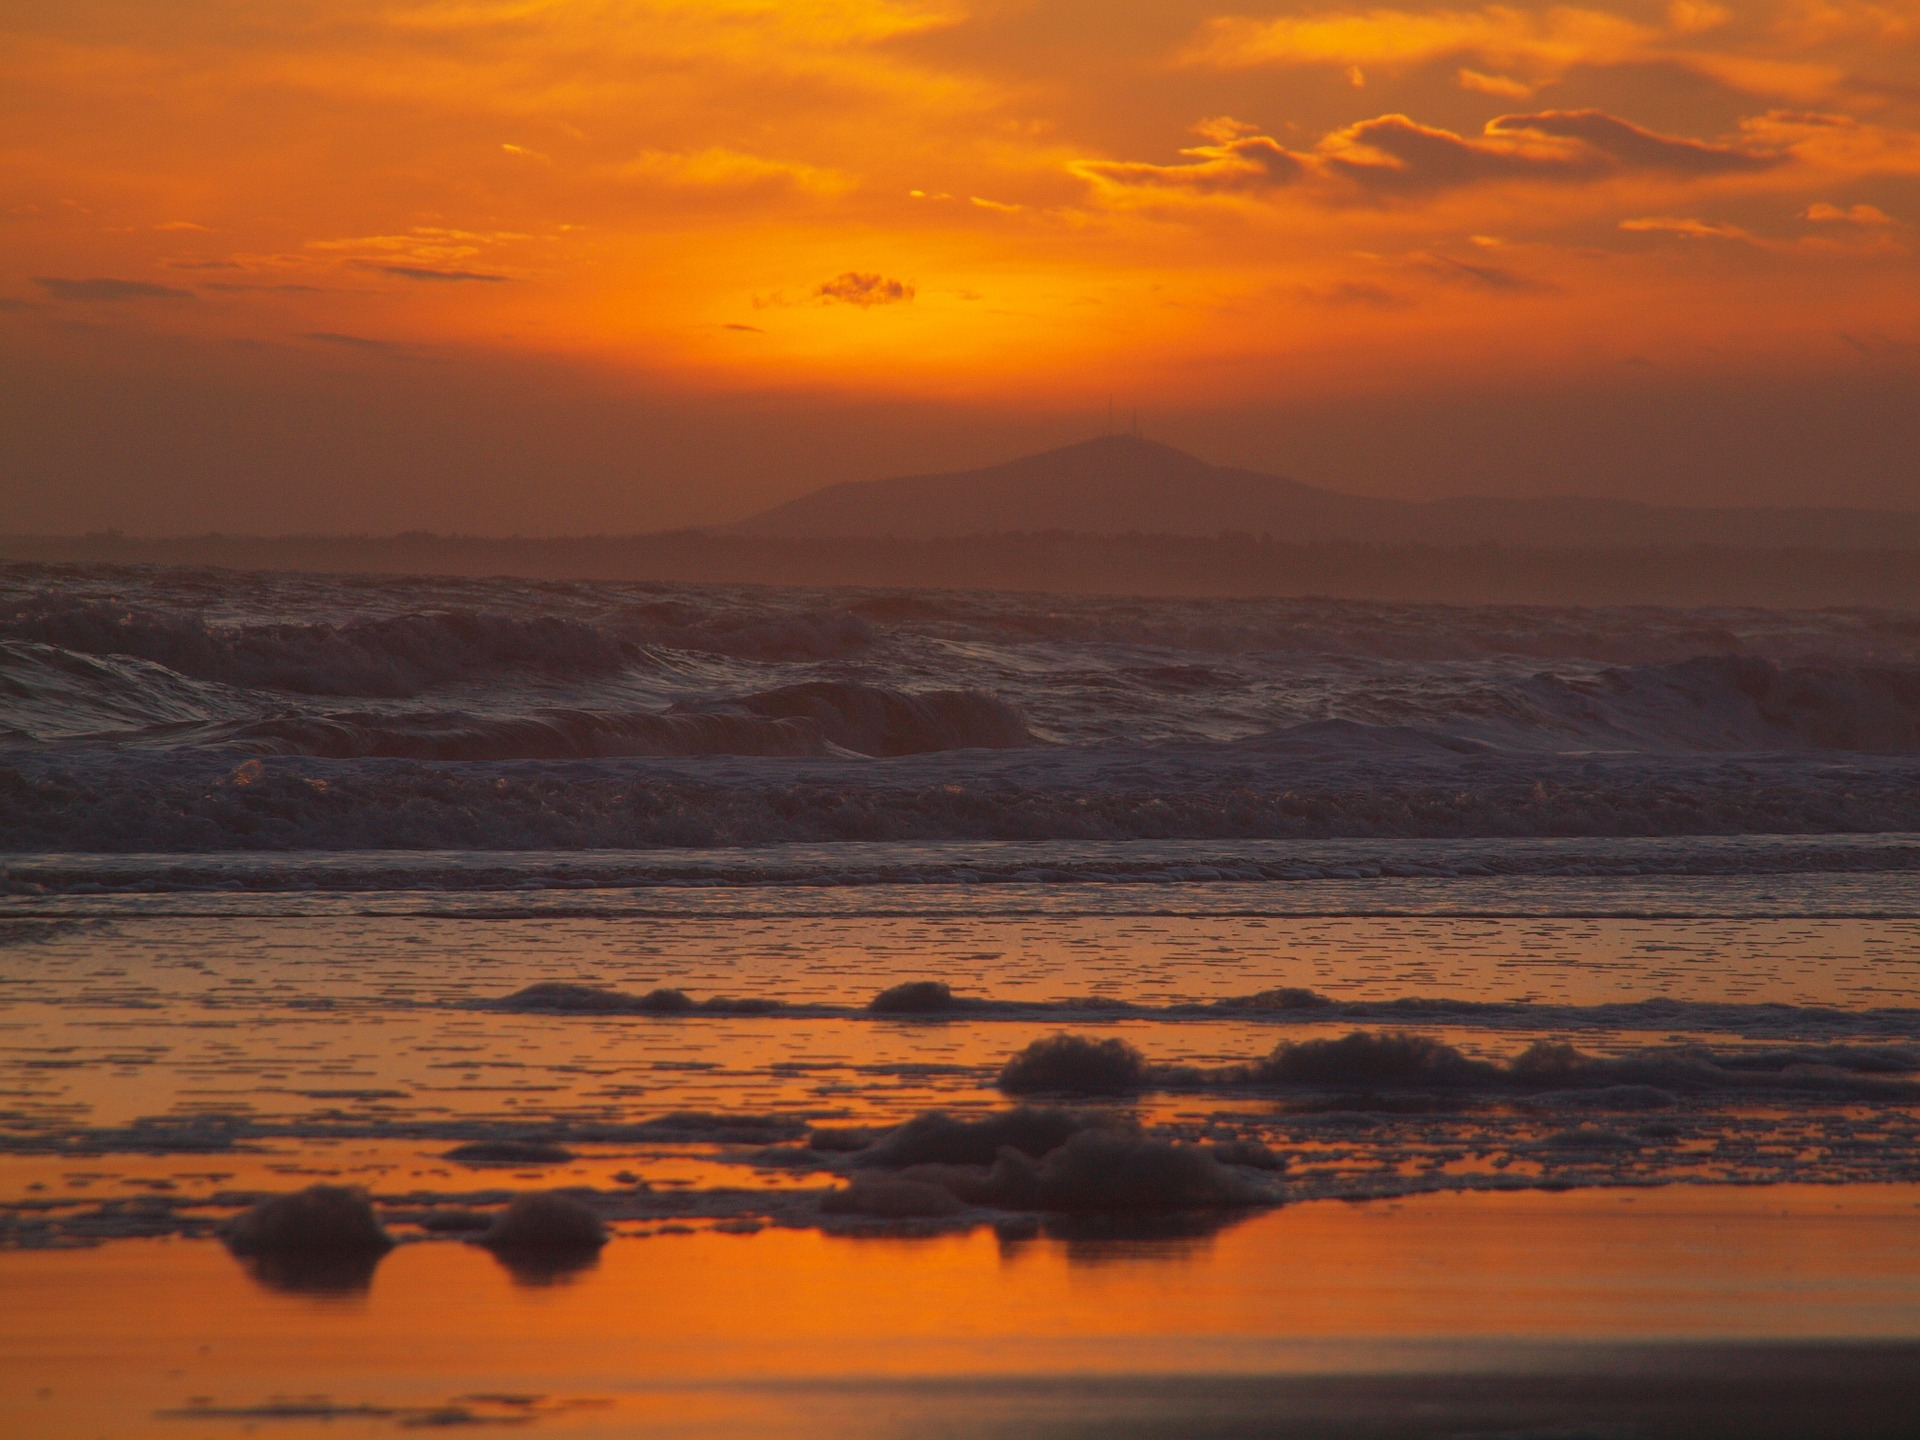 sunset-1094112_1920